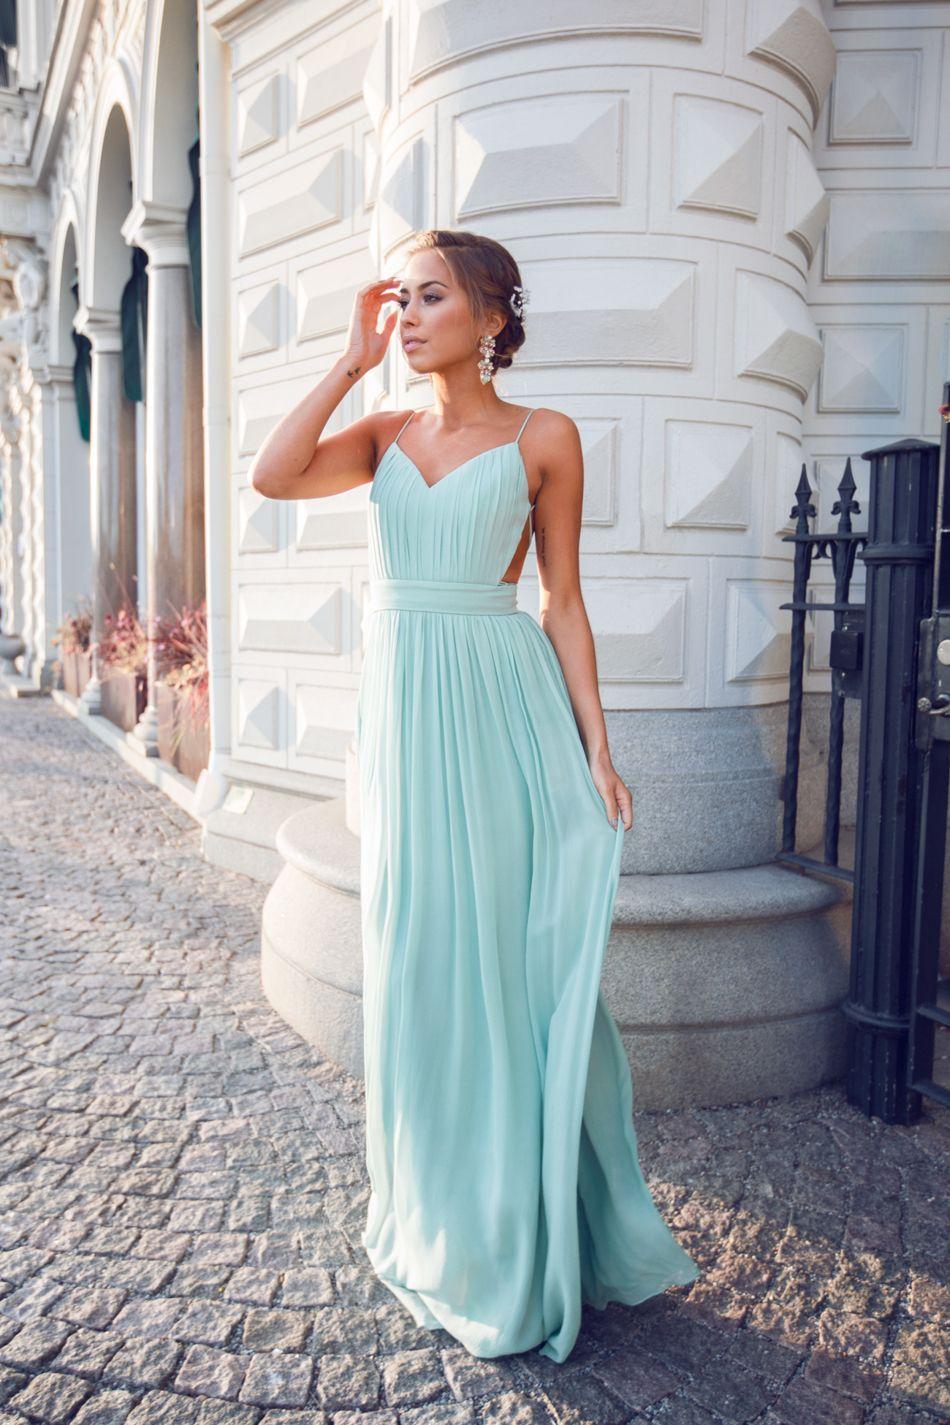 KenzaZouiten_Guldknappen_look_st-2 | misc style | Pinterest | Prom ...